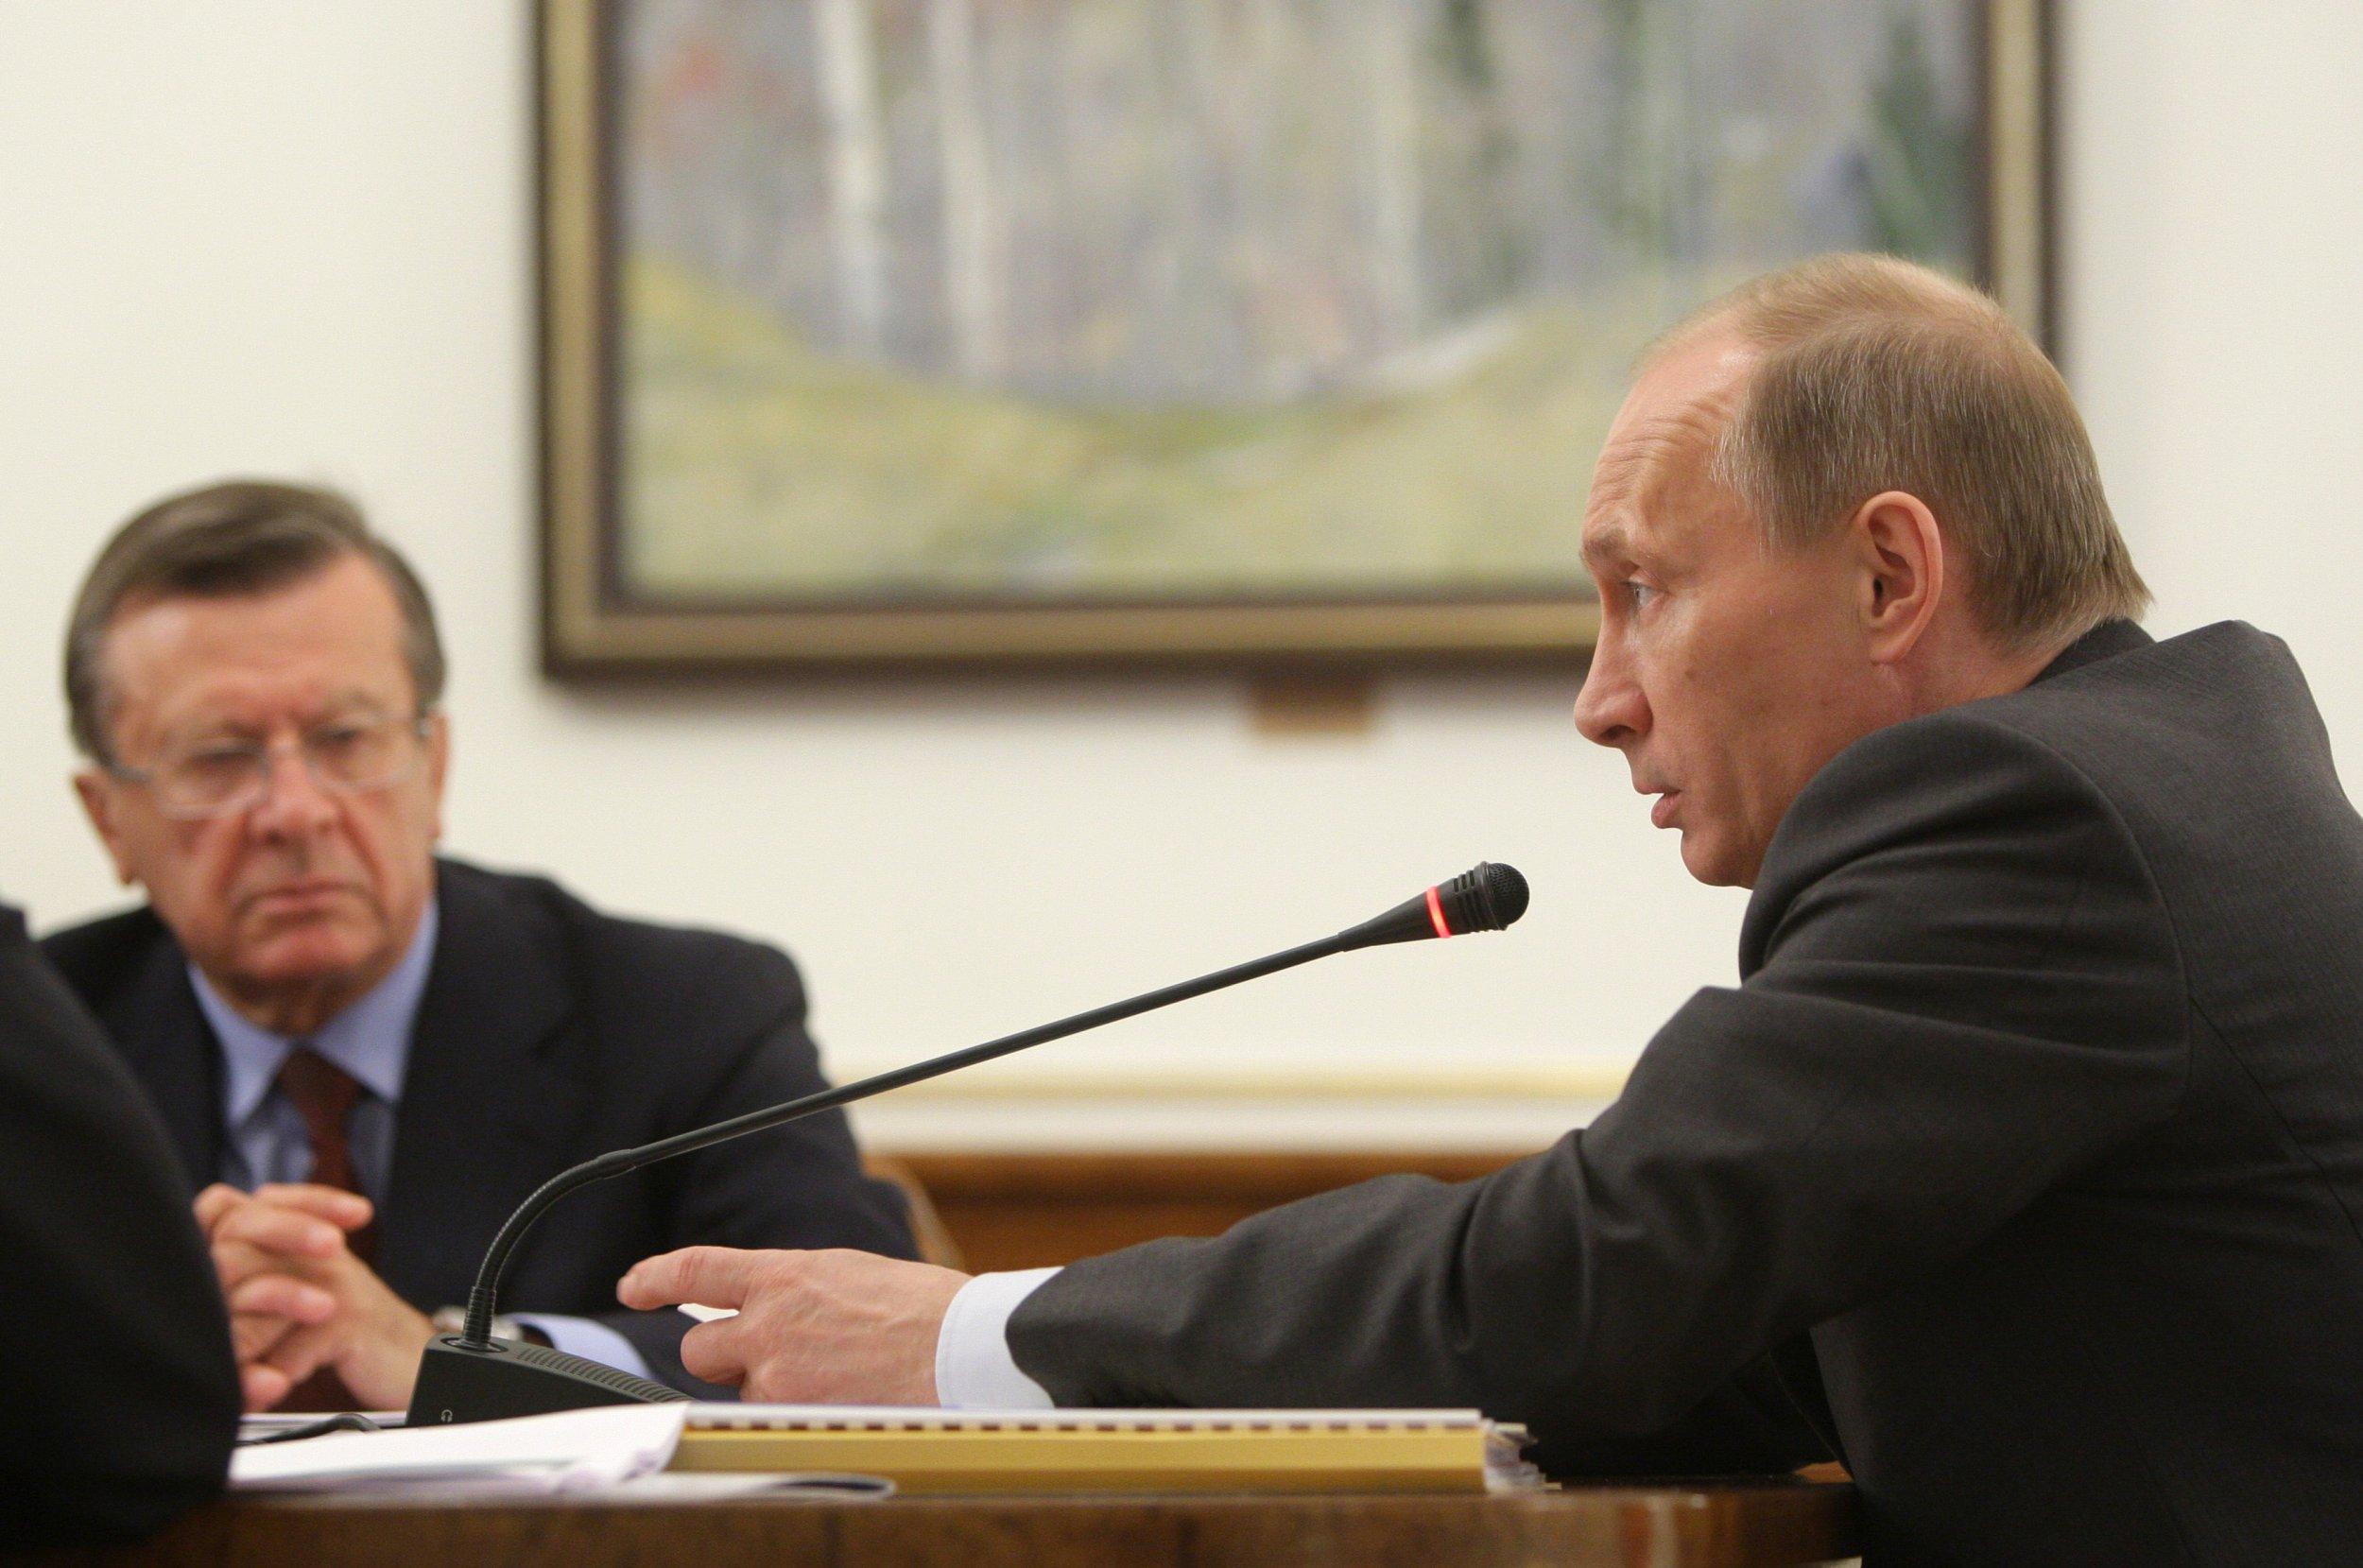 Putin and Zubkov